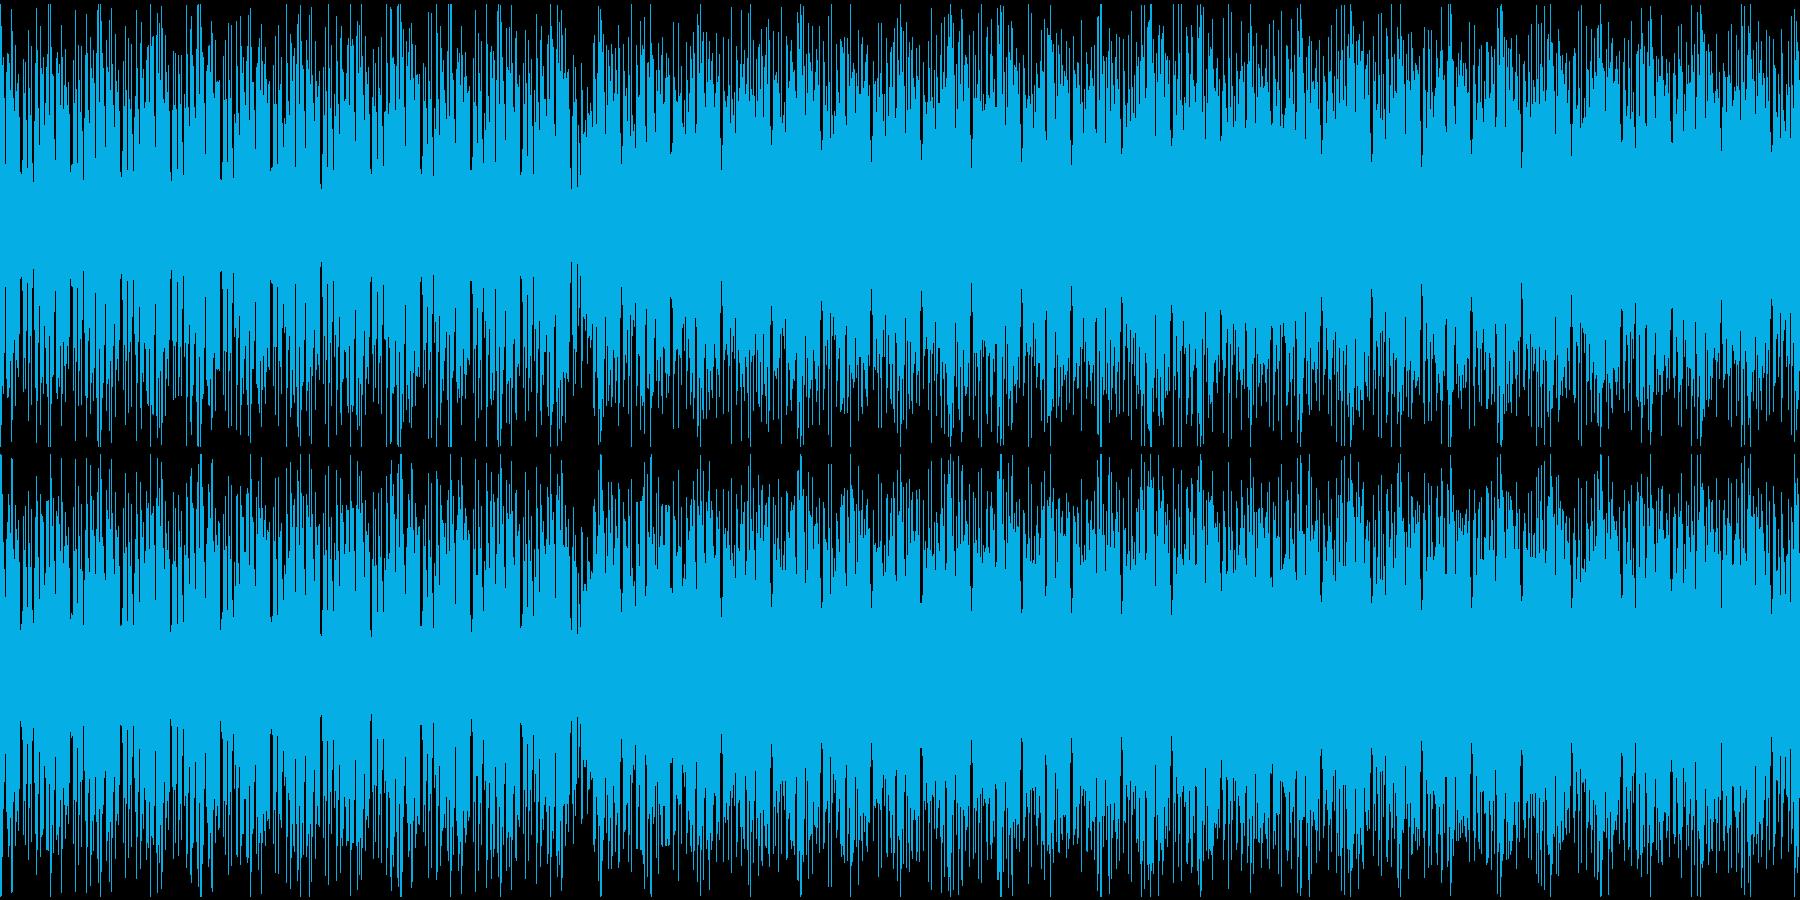 【loop】スポーツやレースに合う爽やかの再生済みの波形